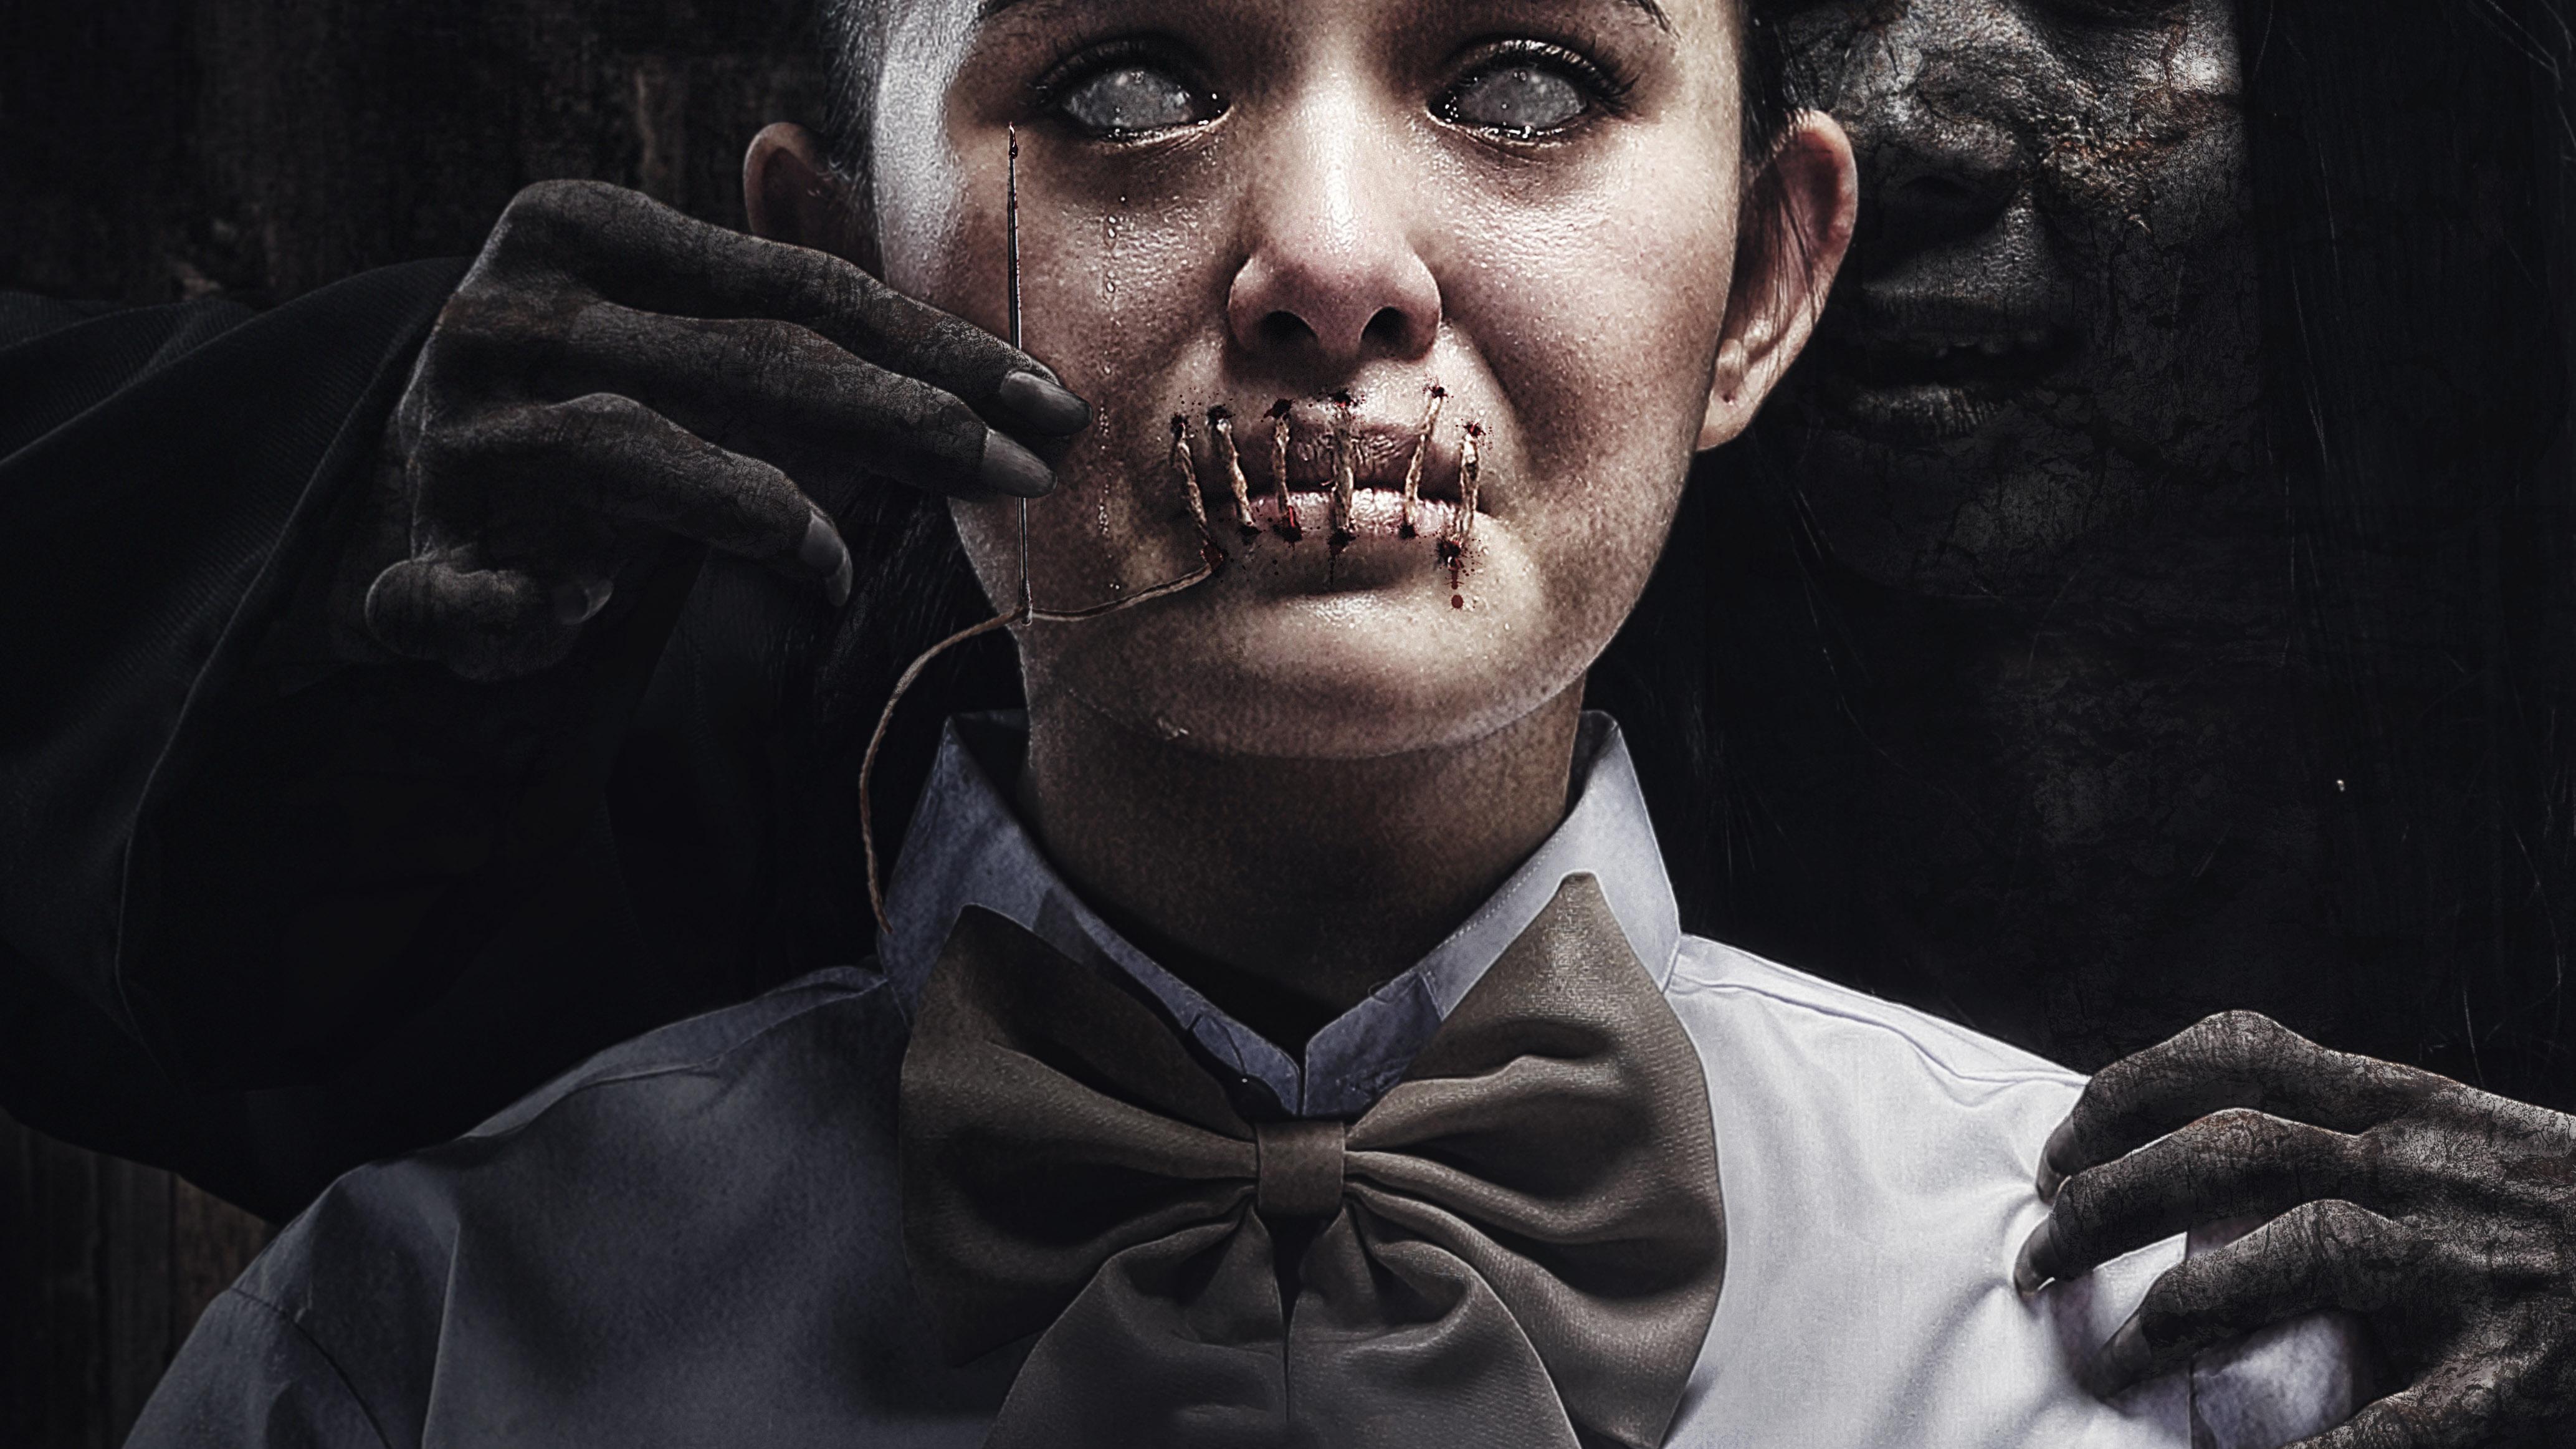 Bisikan Iblis 2018 Movie, HD Movies, 4k Wallpapers, Images